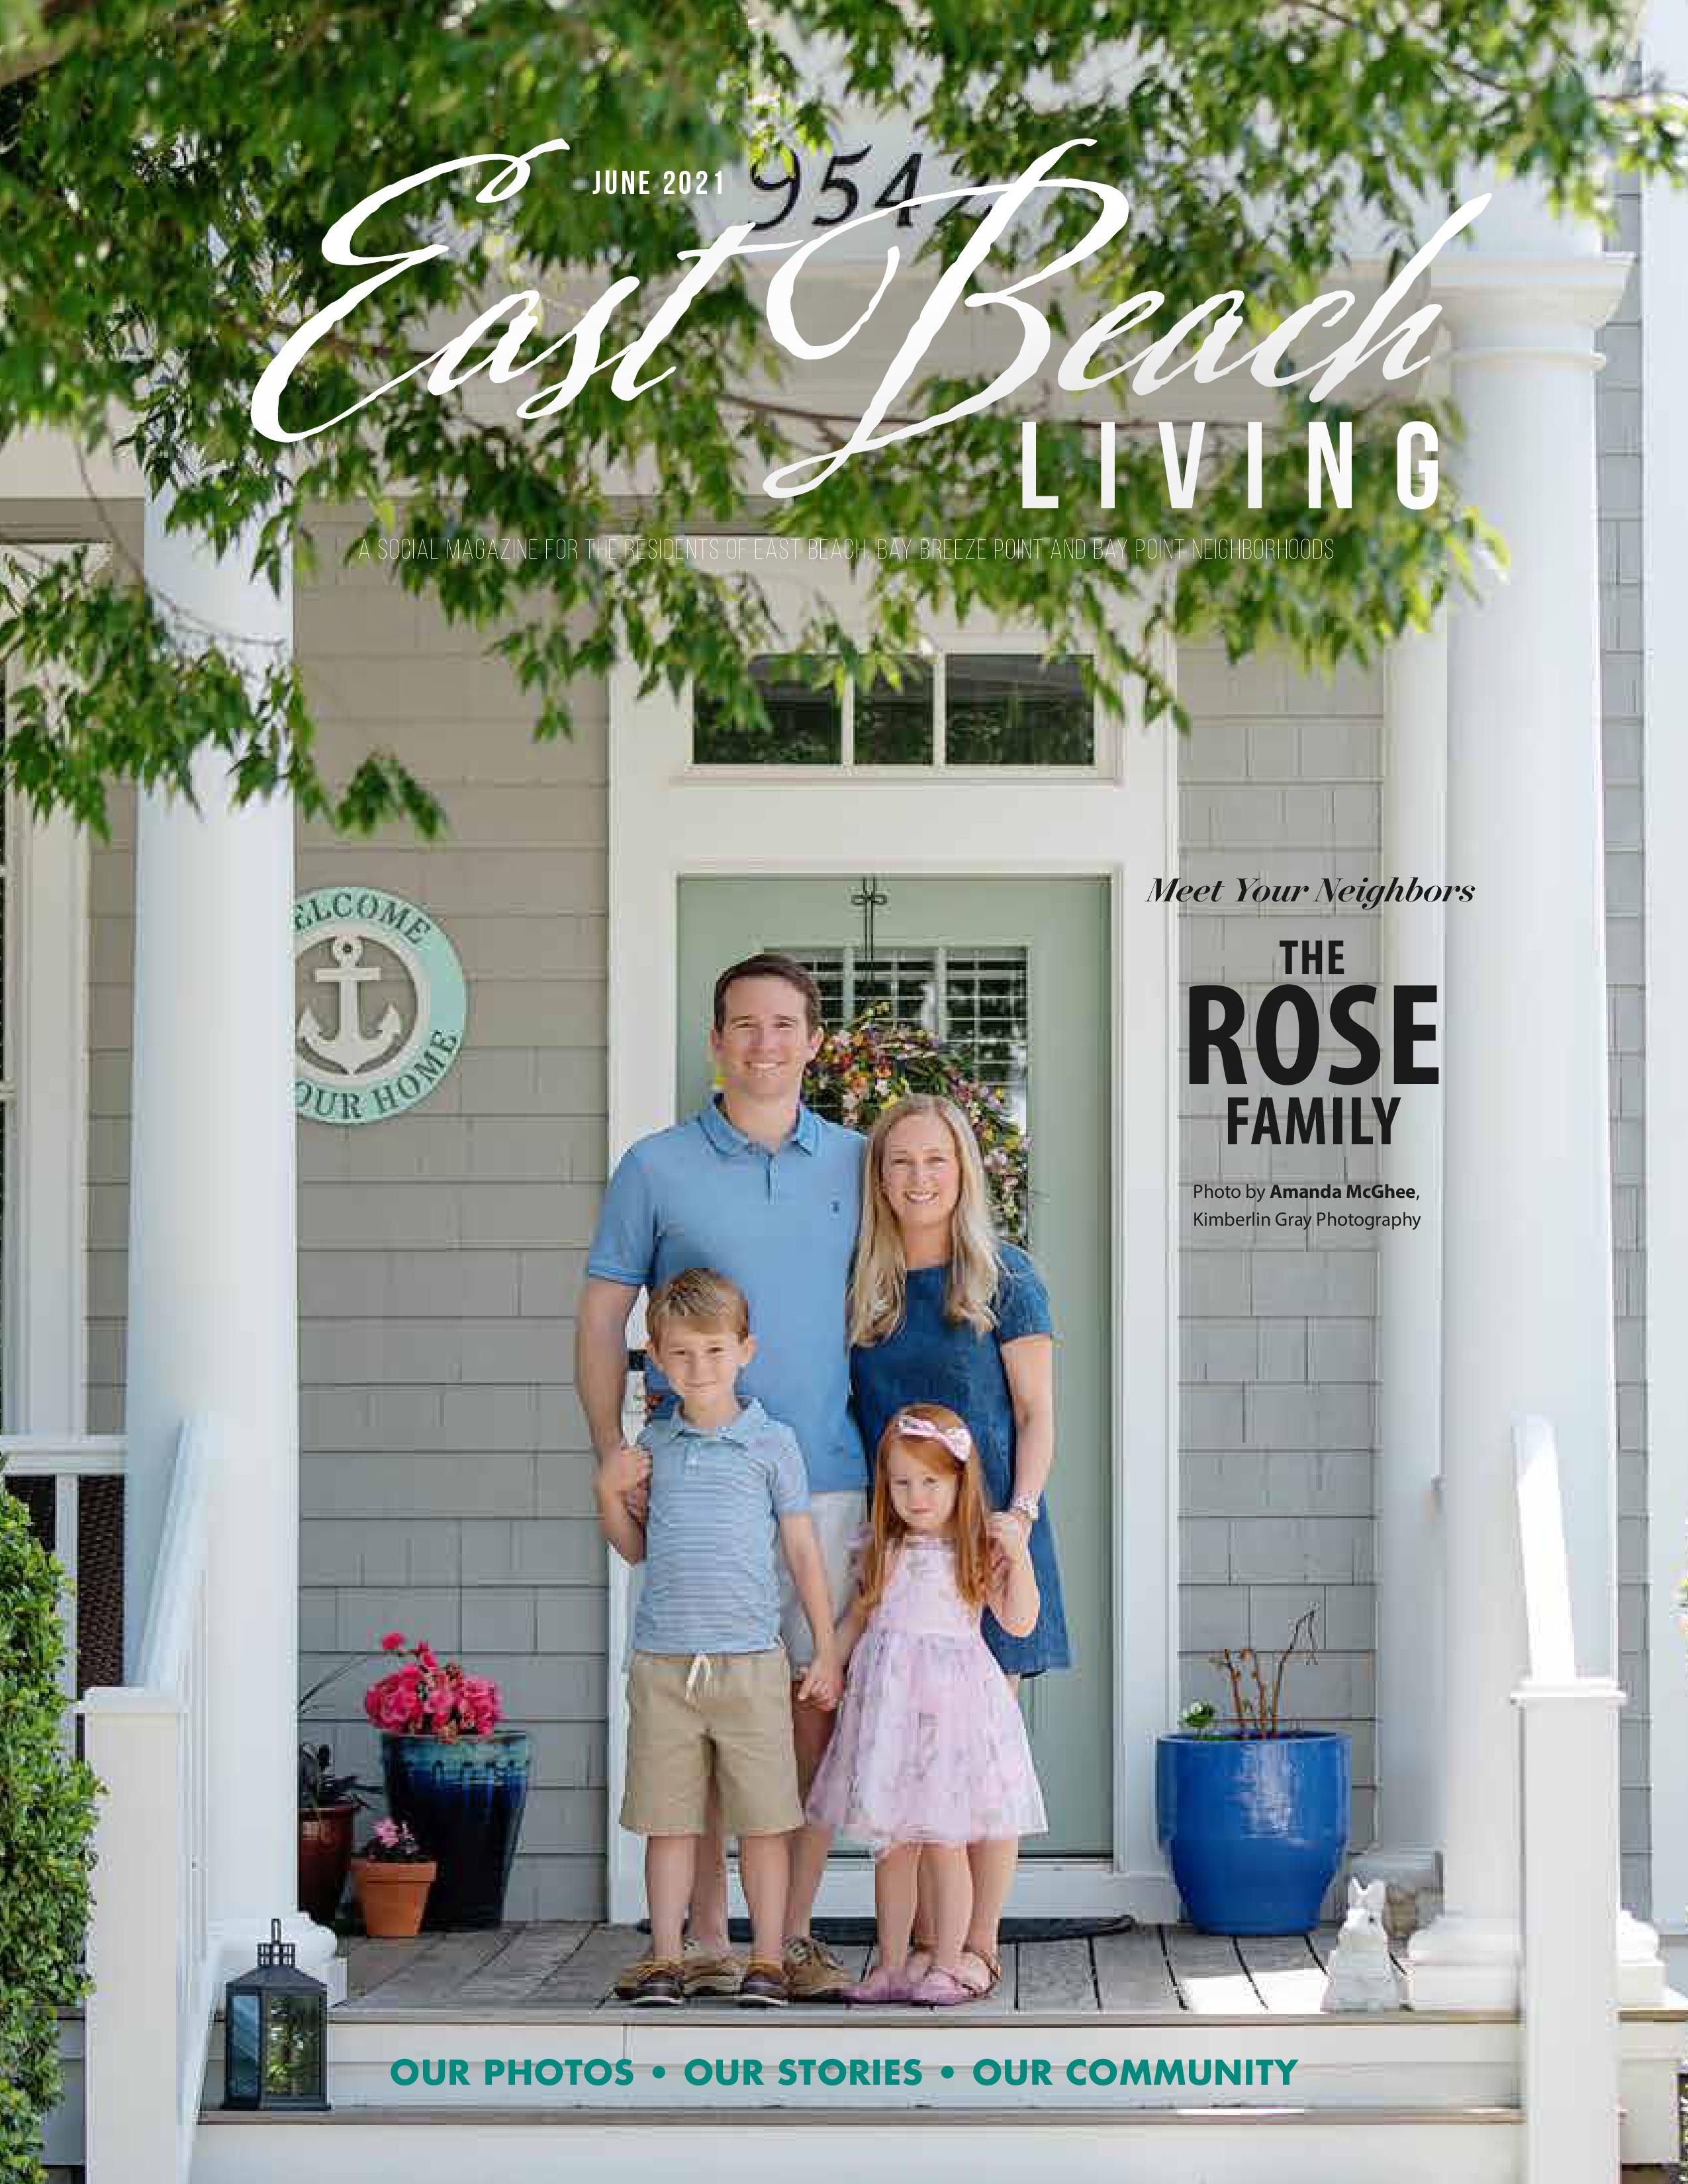 East Beach Living 2021-06-01